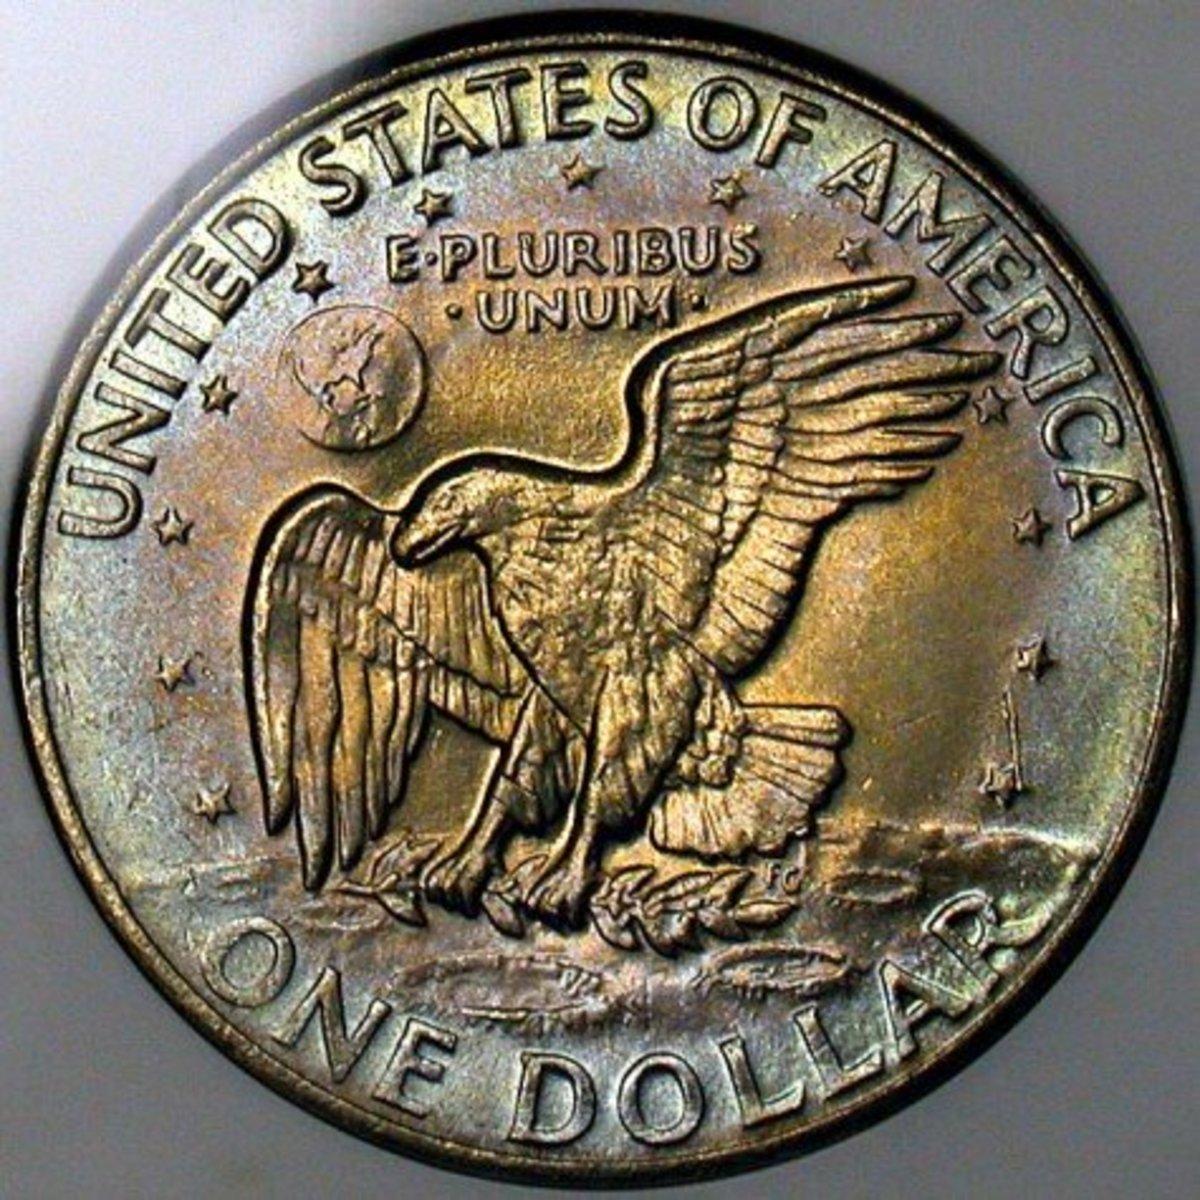 1972 Eisenhower Dollar Variety 3. Photo Courtesy Coinpage.com